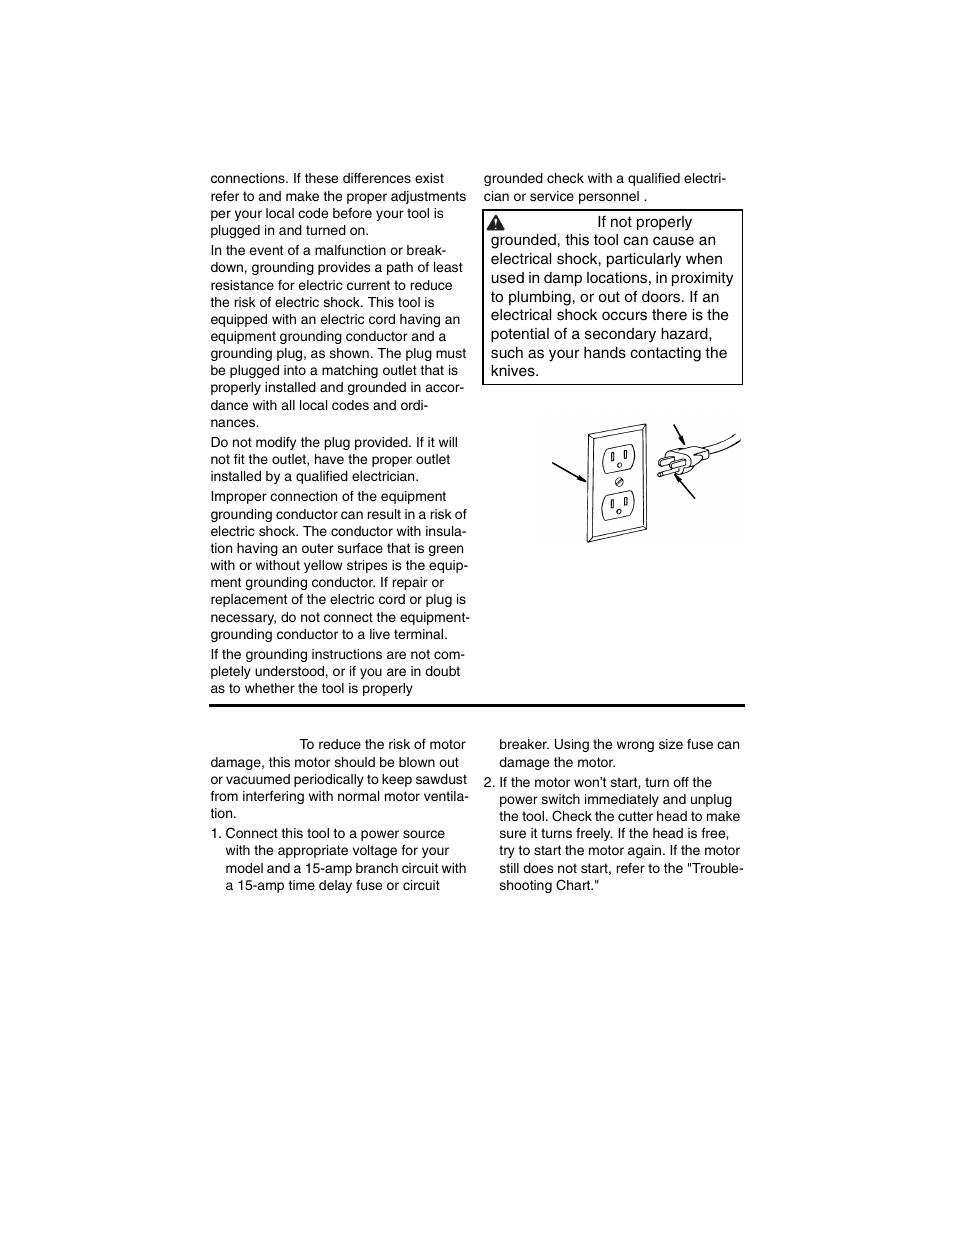 motor safety protection ridgid tp1300 user manual page 9 36 rh manualsdir com